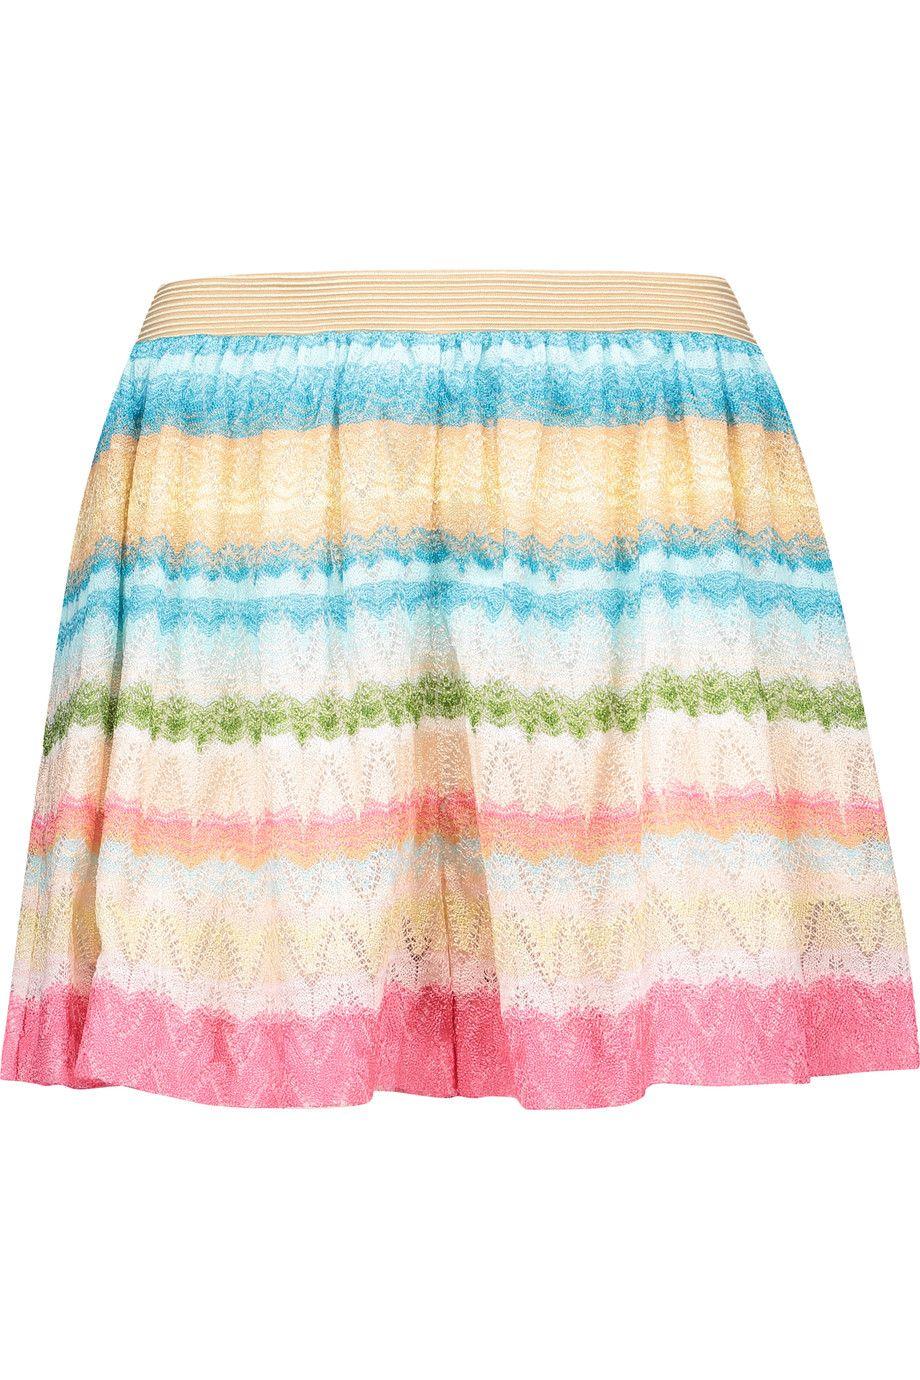 MISSONI Crochet-Knit Shorts. #missoni #cloth #shorts